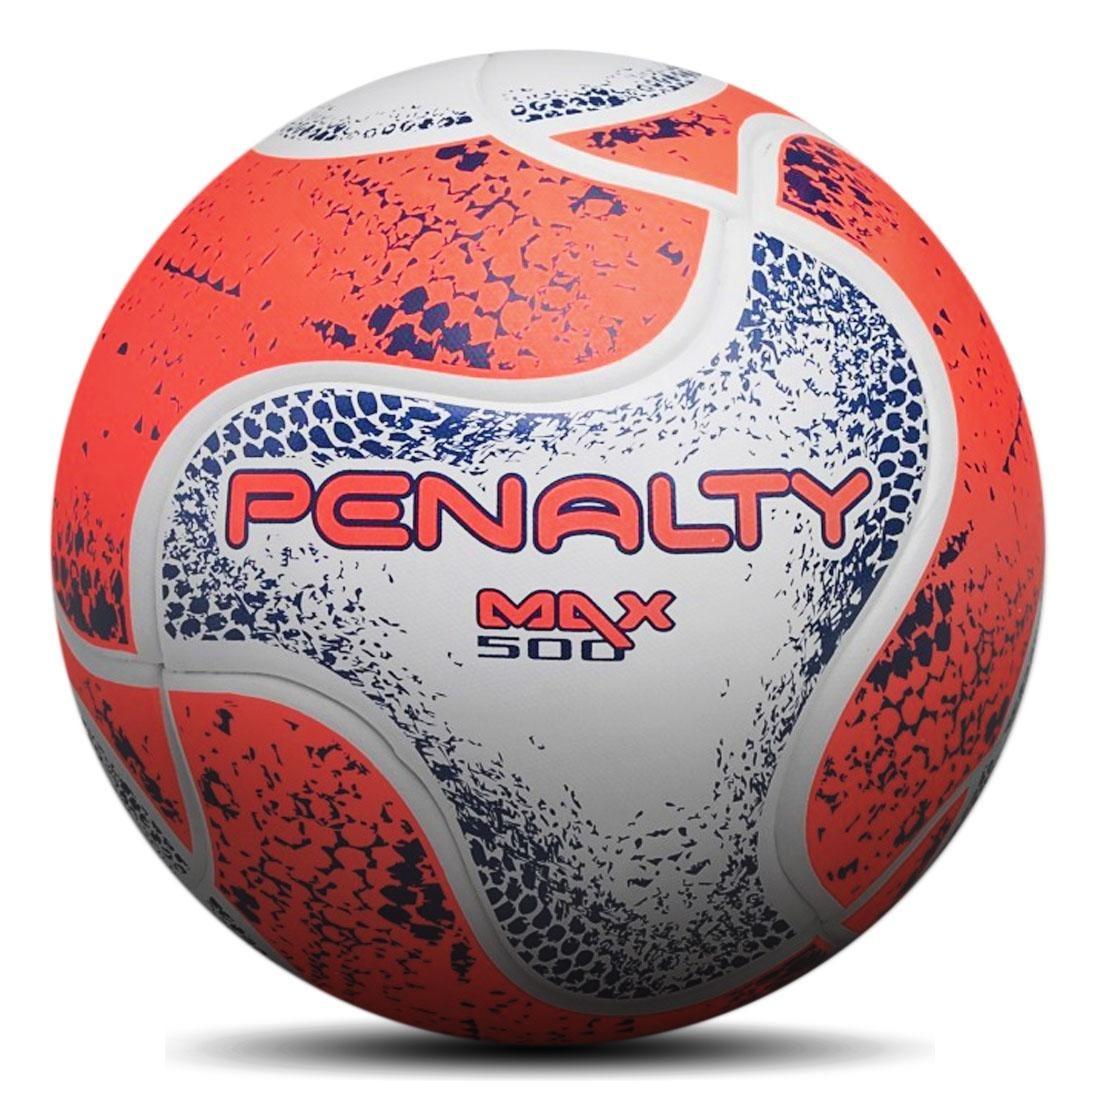 cfbc06bc68 kit 3 bolas futsal penalty max 500 termotec 2018. Carregando zoom.